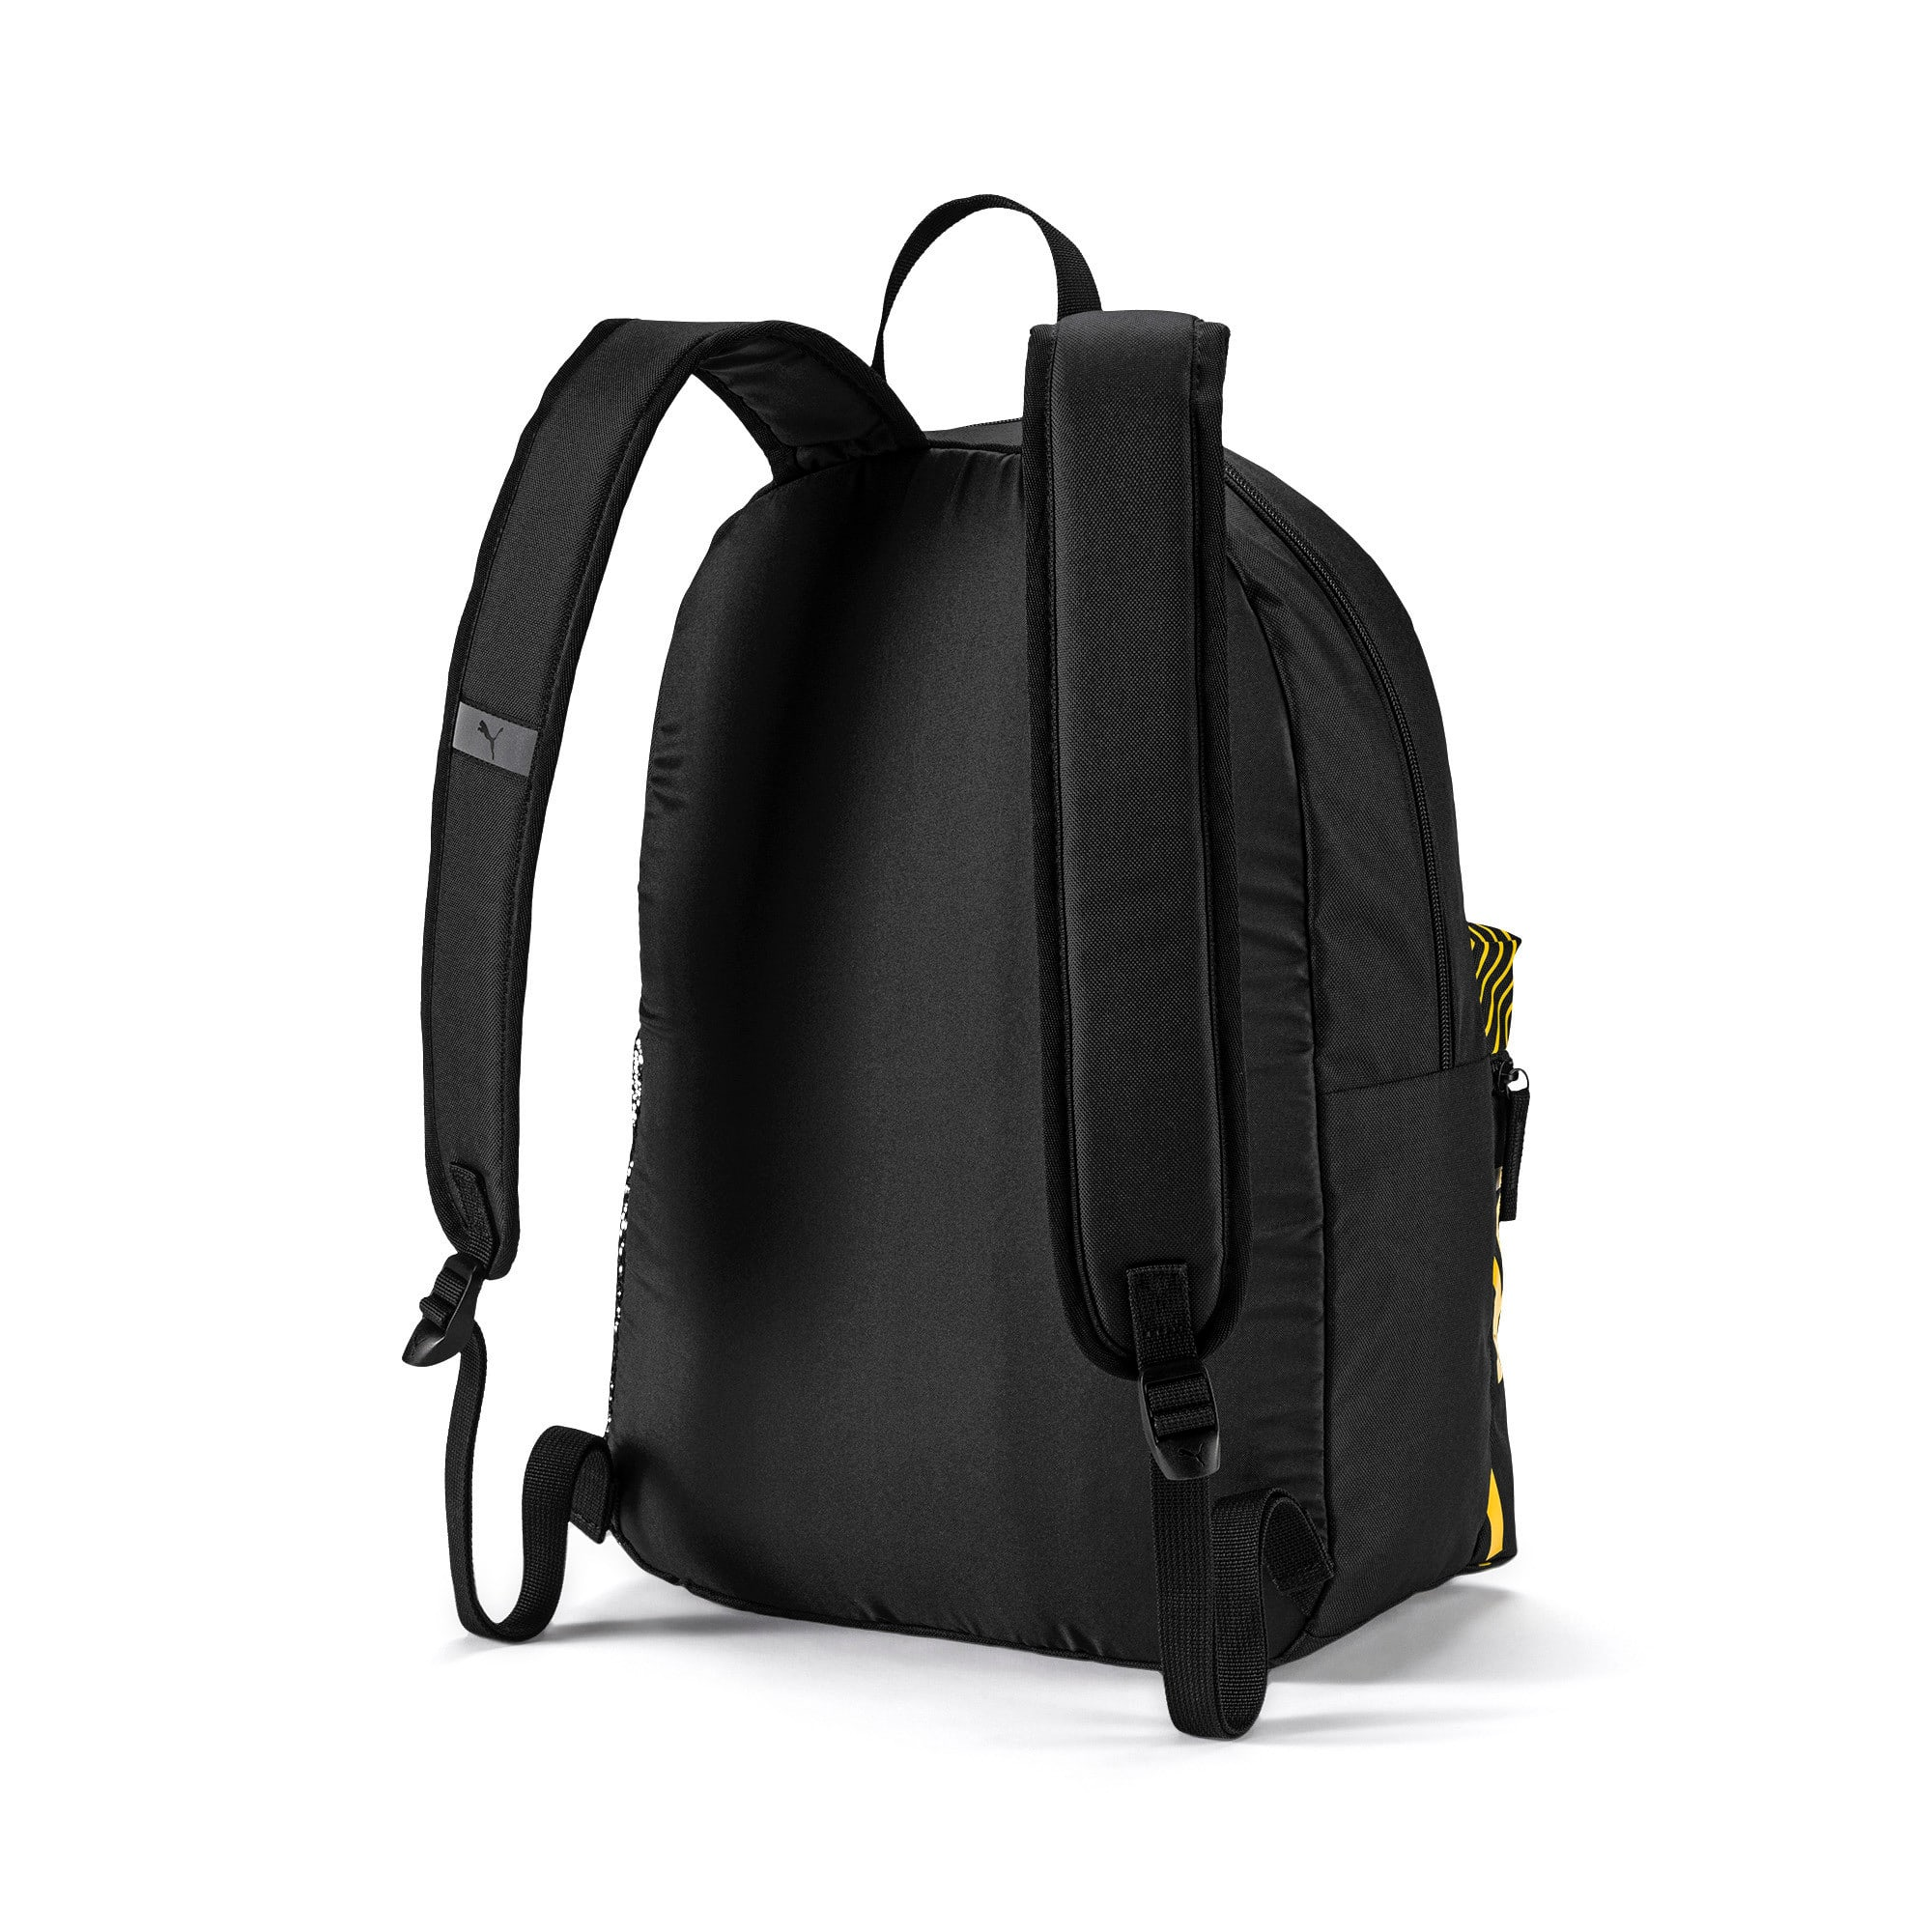 Thumbnail 2 of BVB DNA Backpack, Puma Black-Cyber Yellow, medium